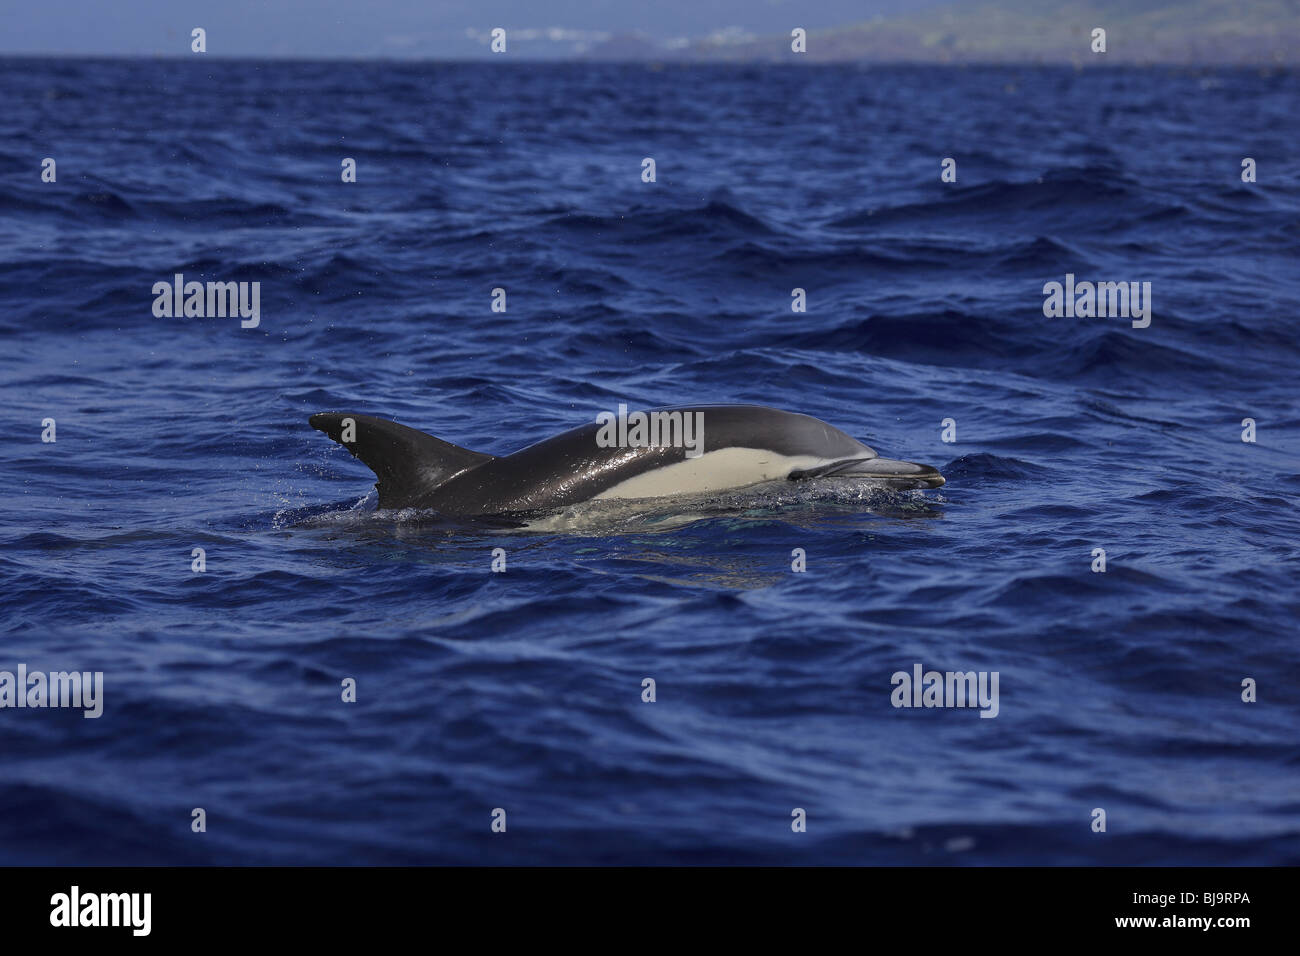 A common dolphin (delphinus delphis) takes a breath off Pico Island, Azores, Portugal. Picture taken on a whale - Stock Image